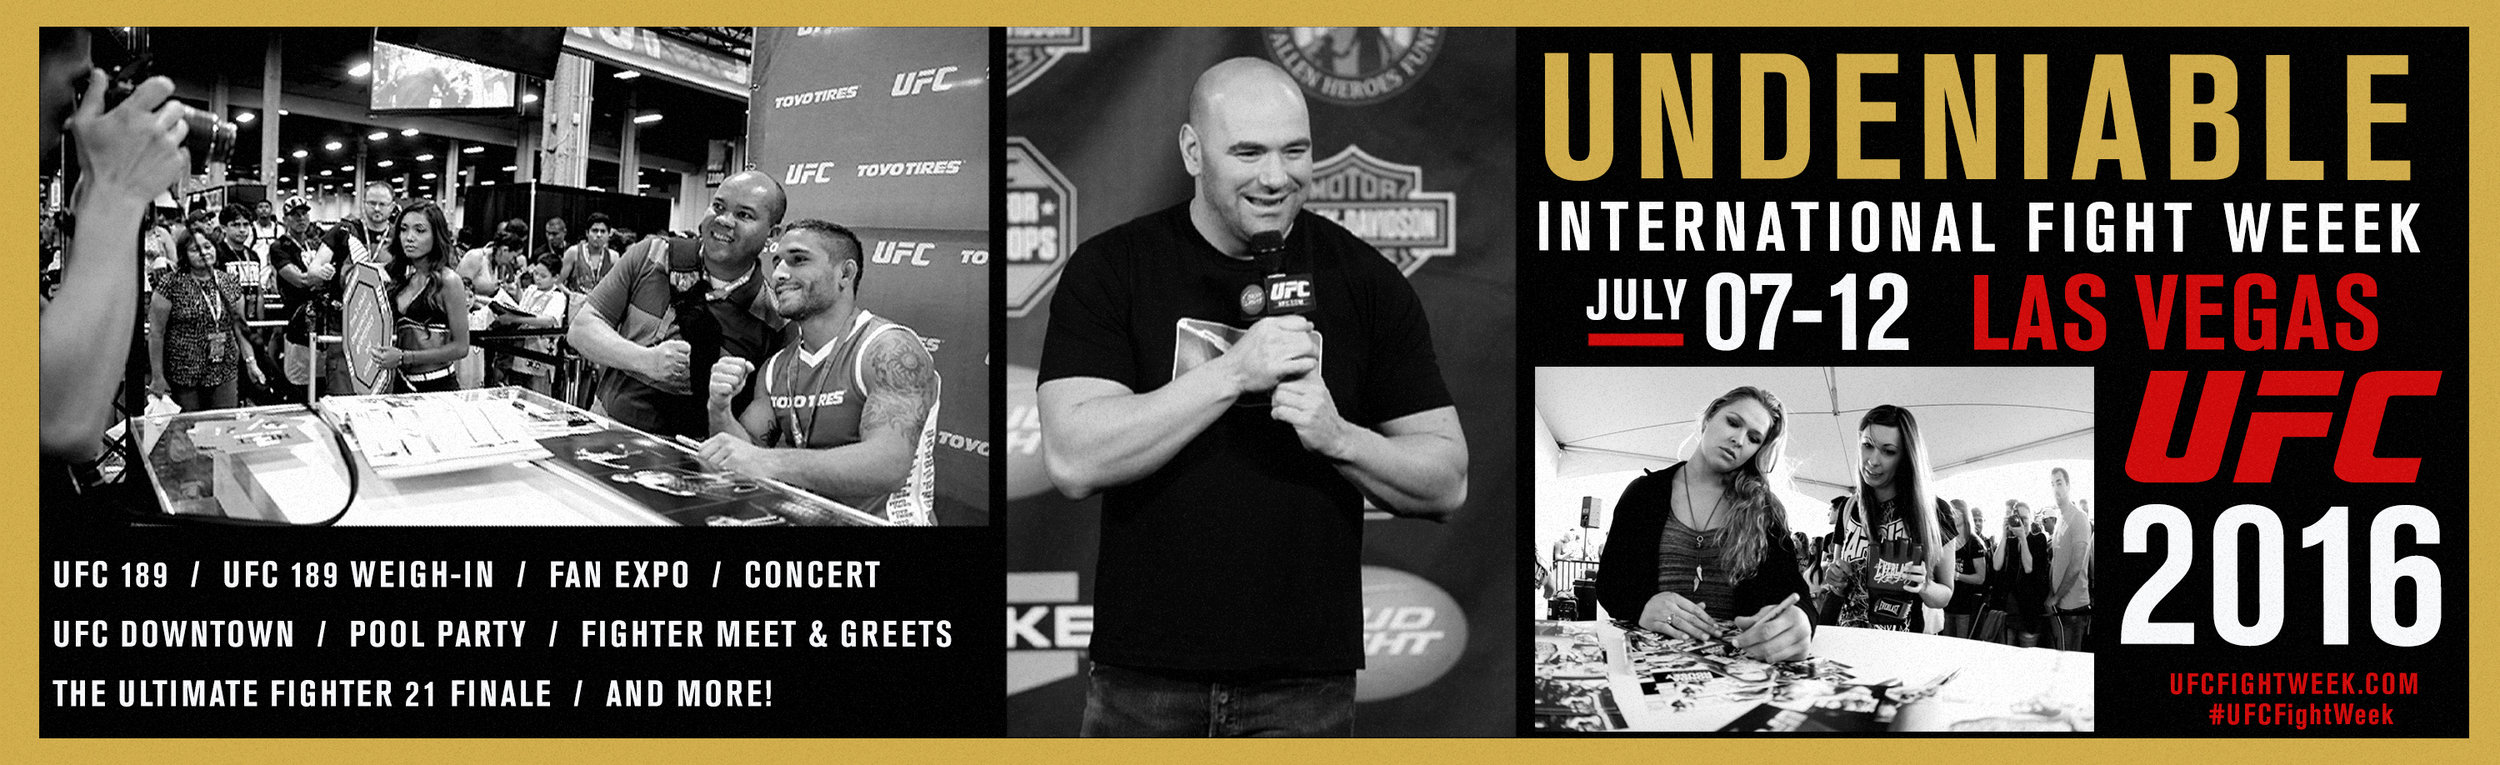 UFC_Undeniable_01_v01d.jpg